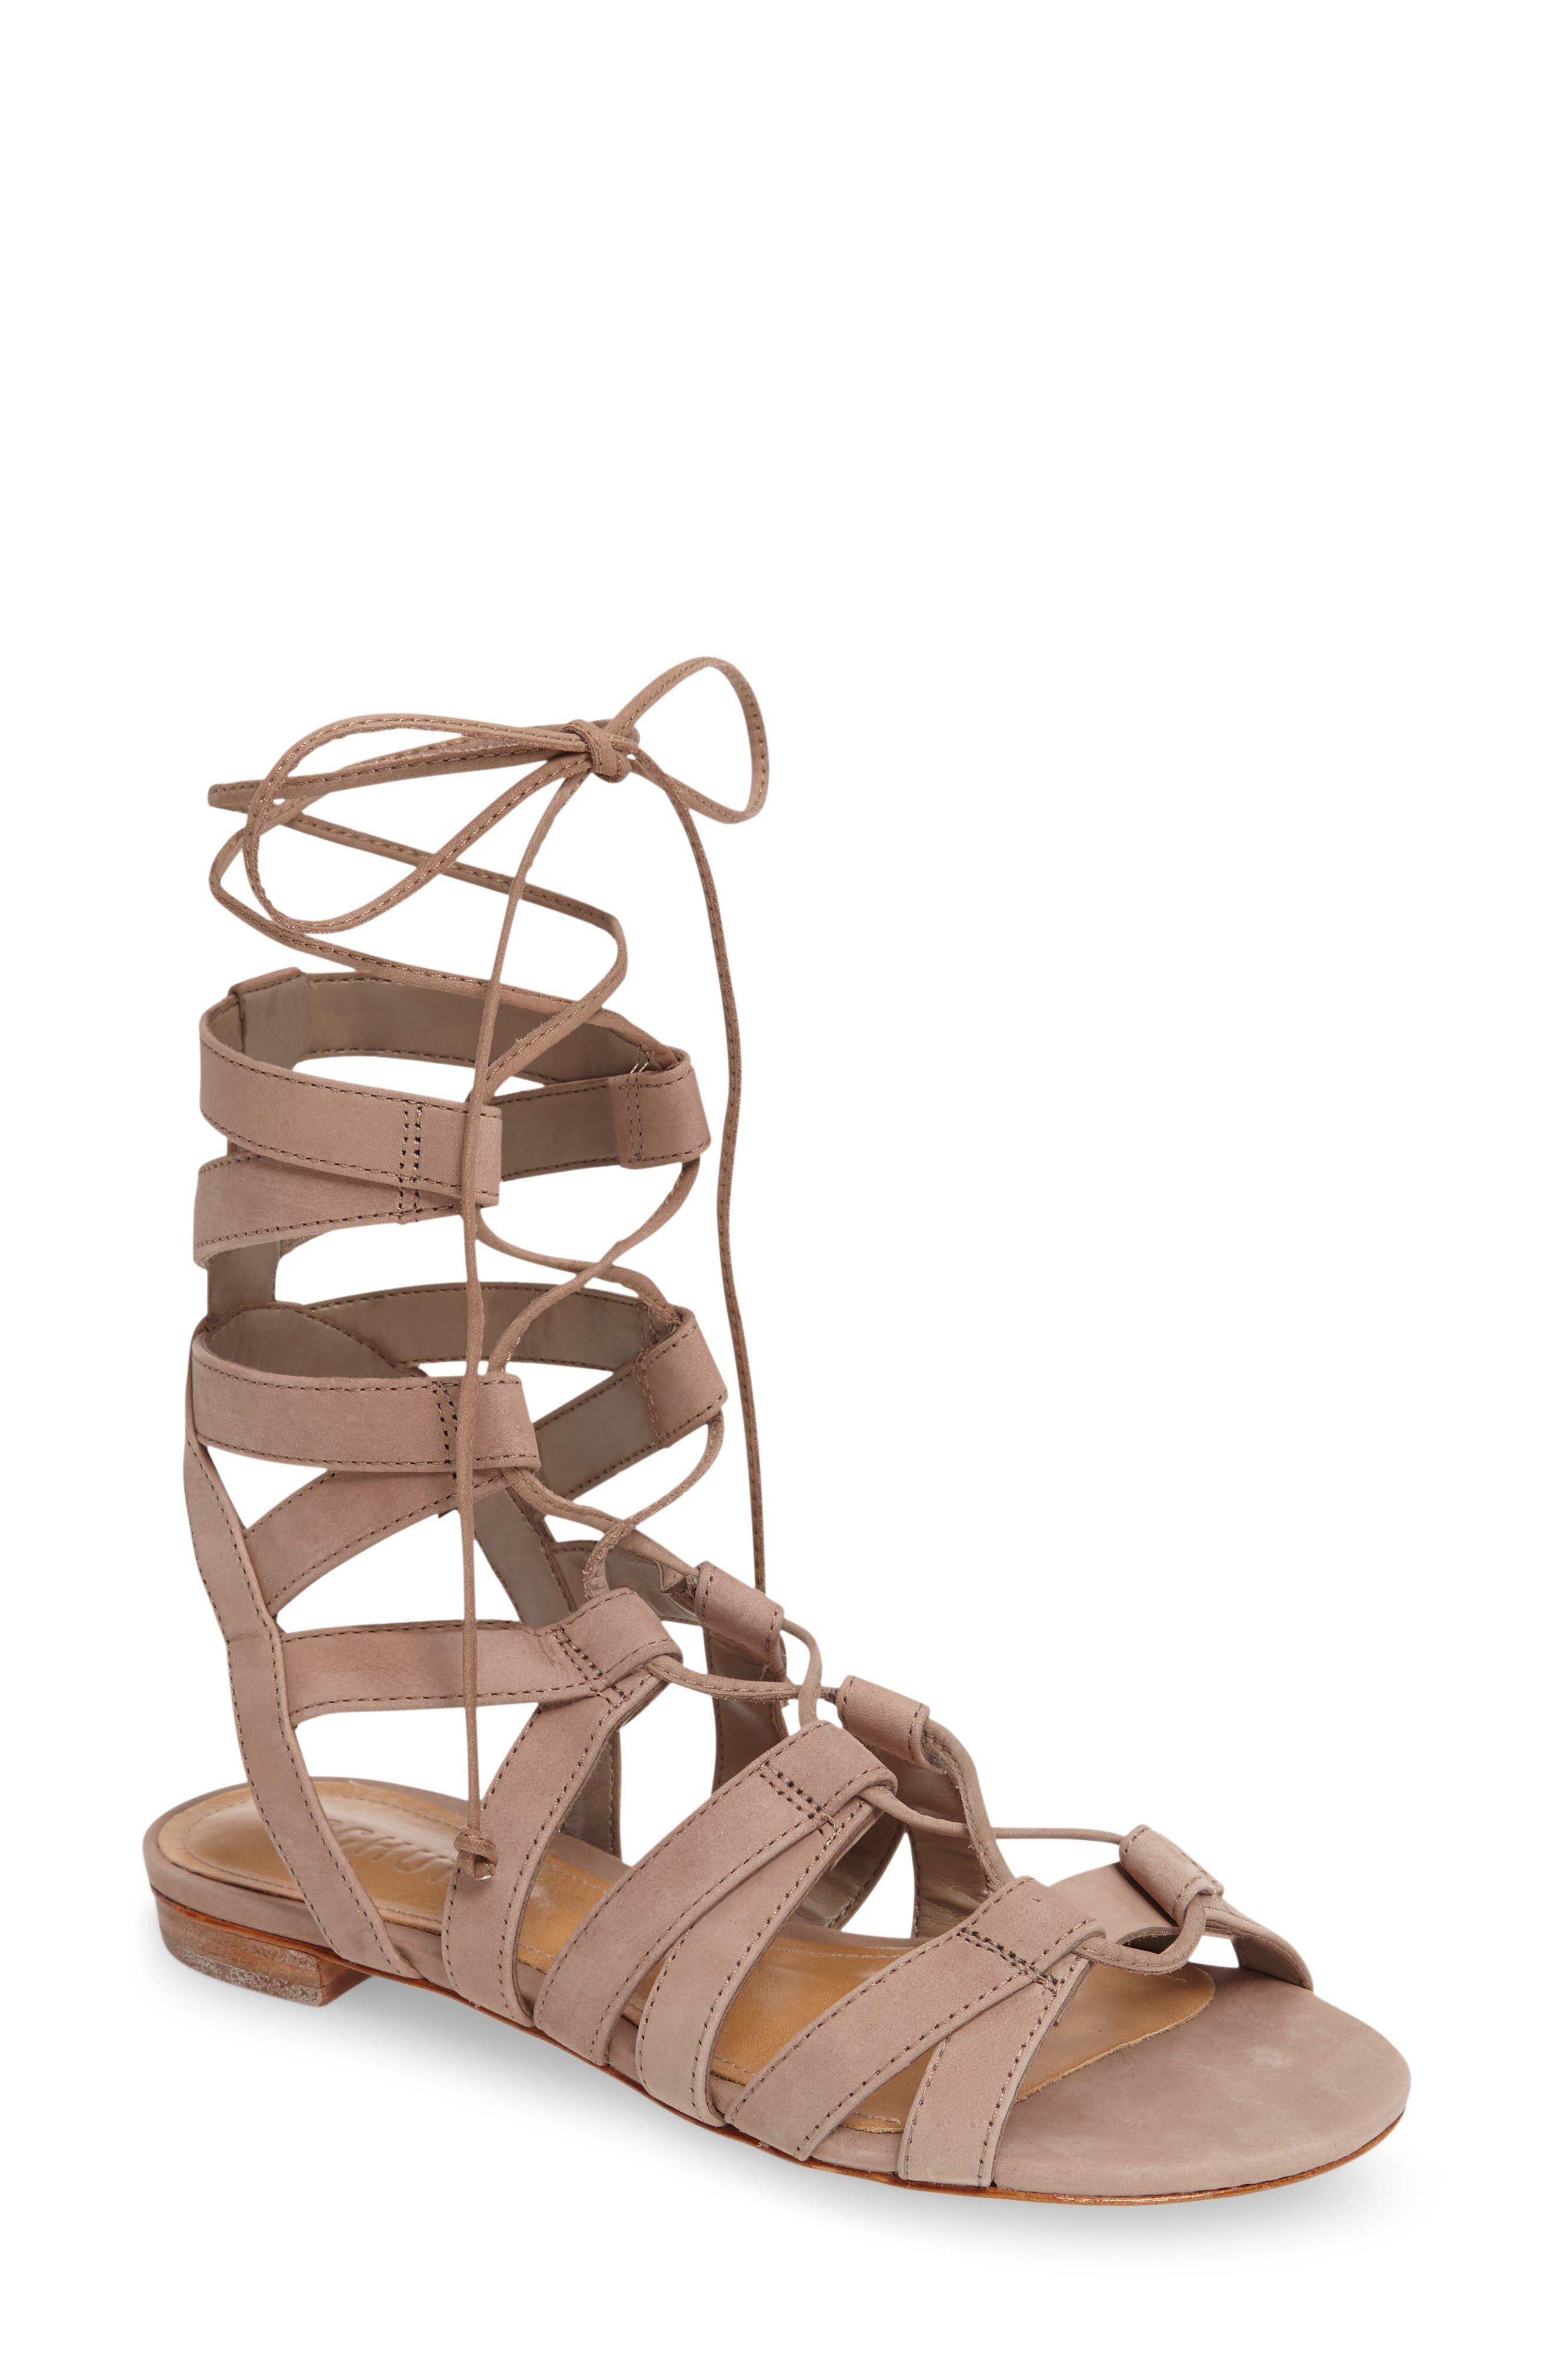 Alternate Image 1 Selected - Schutz Berlina Ghillie Gladiator Sandal (Women)